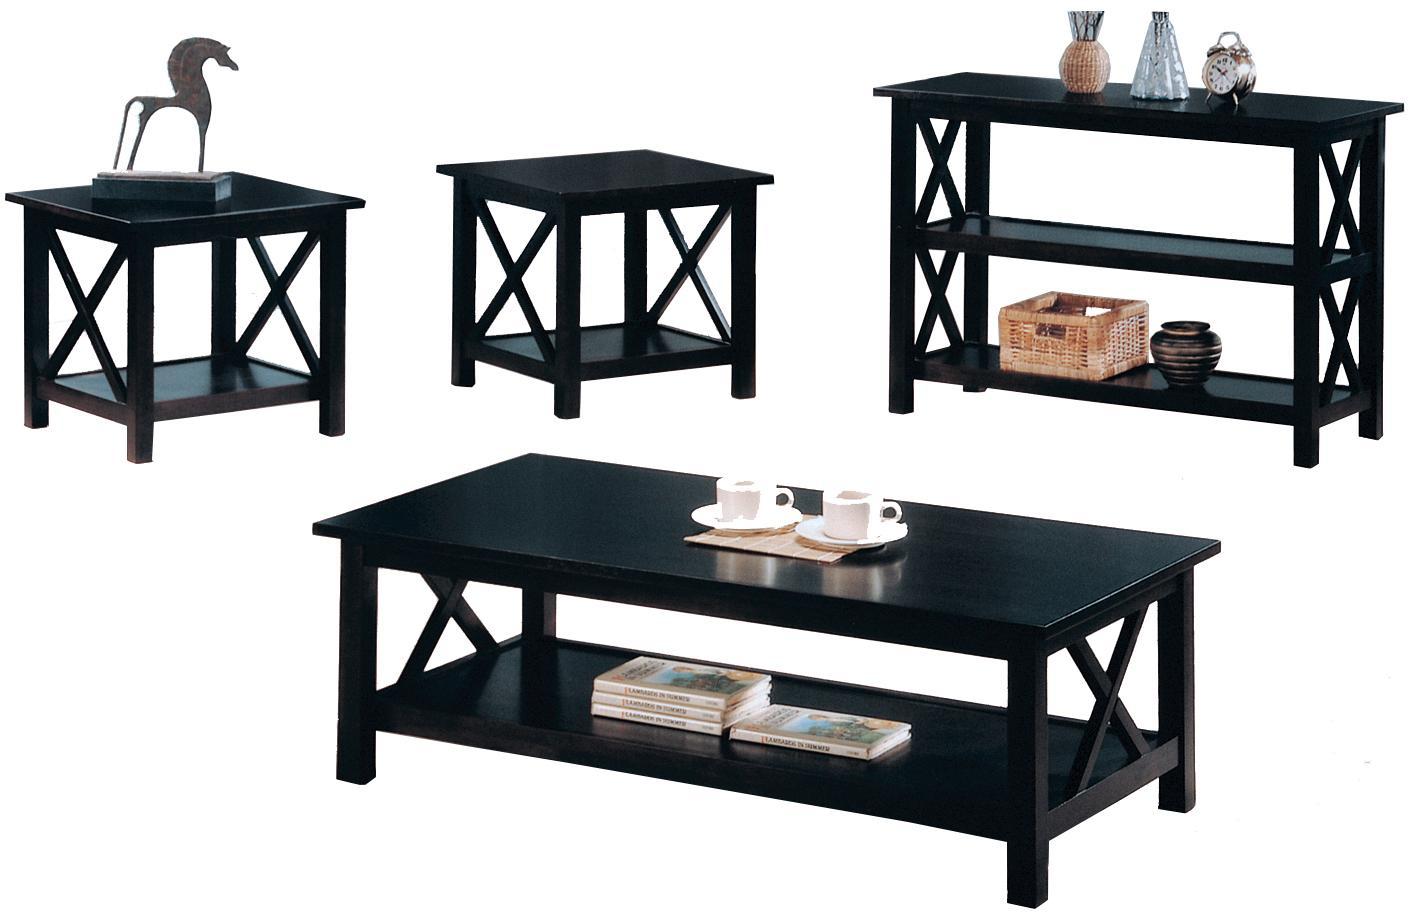 Briarcliff 5900 5910 By Michael Alan Csr Select Michael Alan Furniture Design Michael Alan Csr Select Briarcliff Dealer